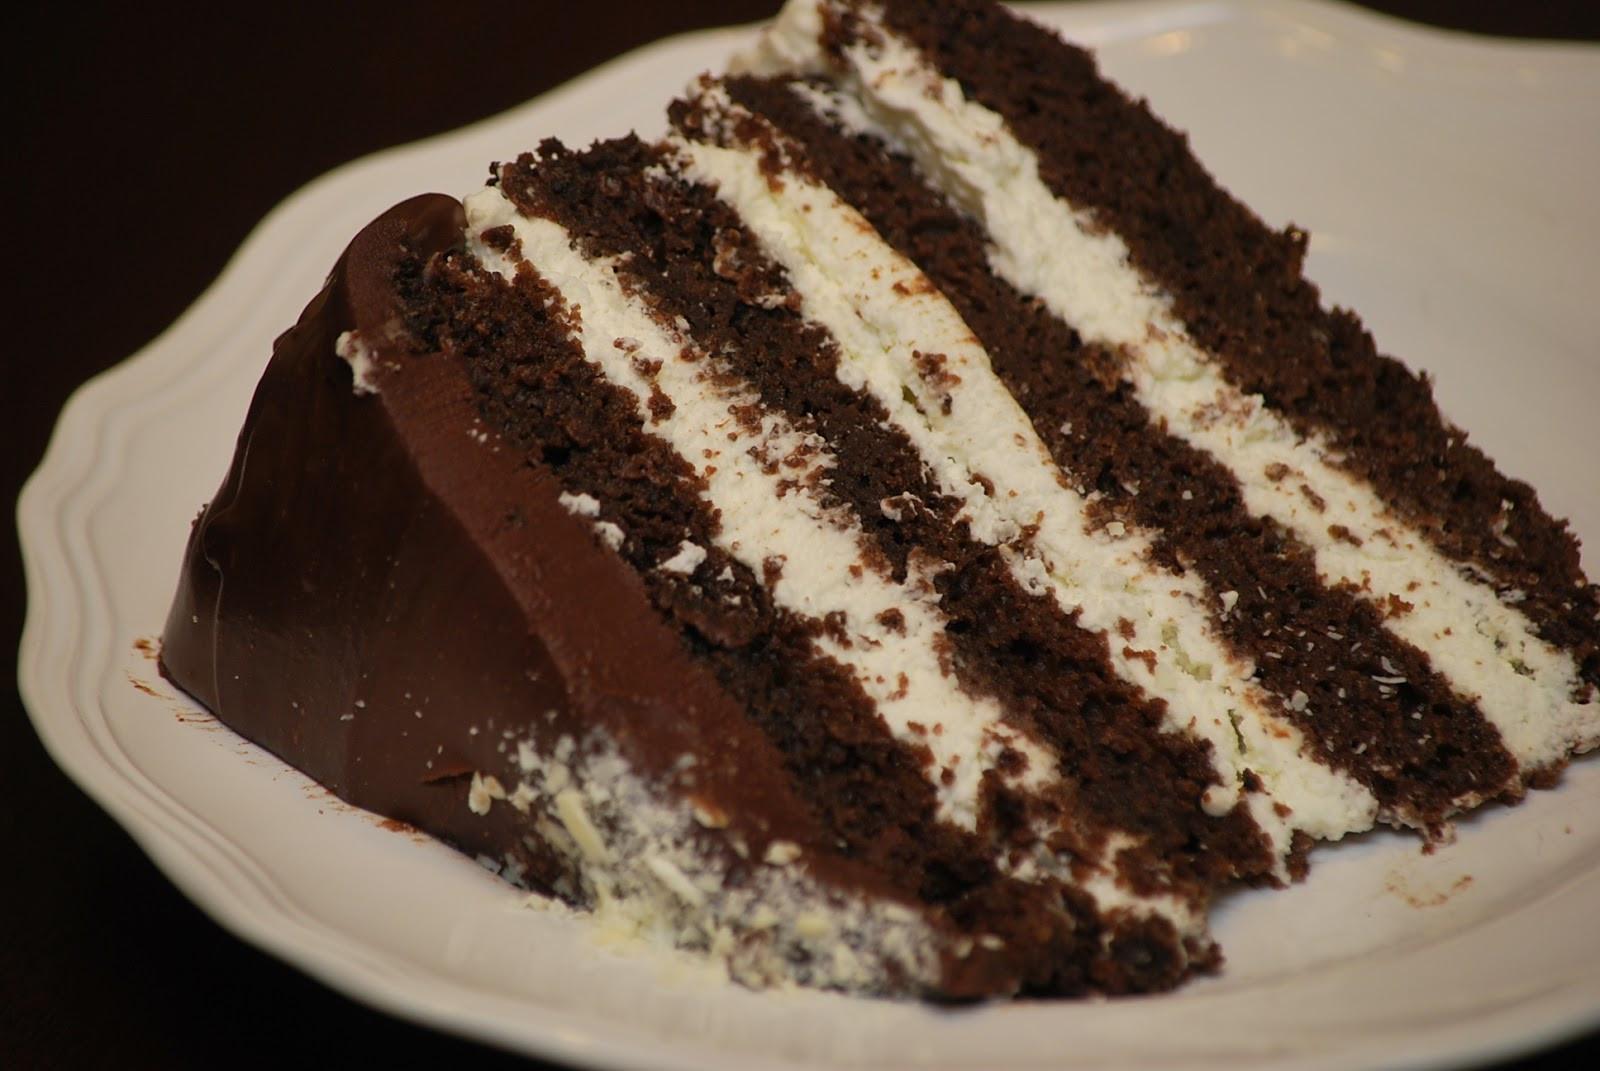 Chocolate Cake Filling  My story in recipes Dark Chocolate Birthday Cake